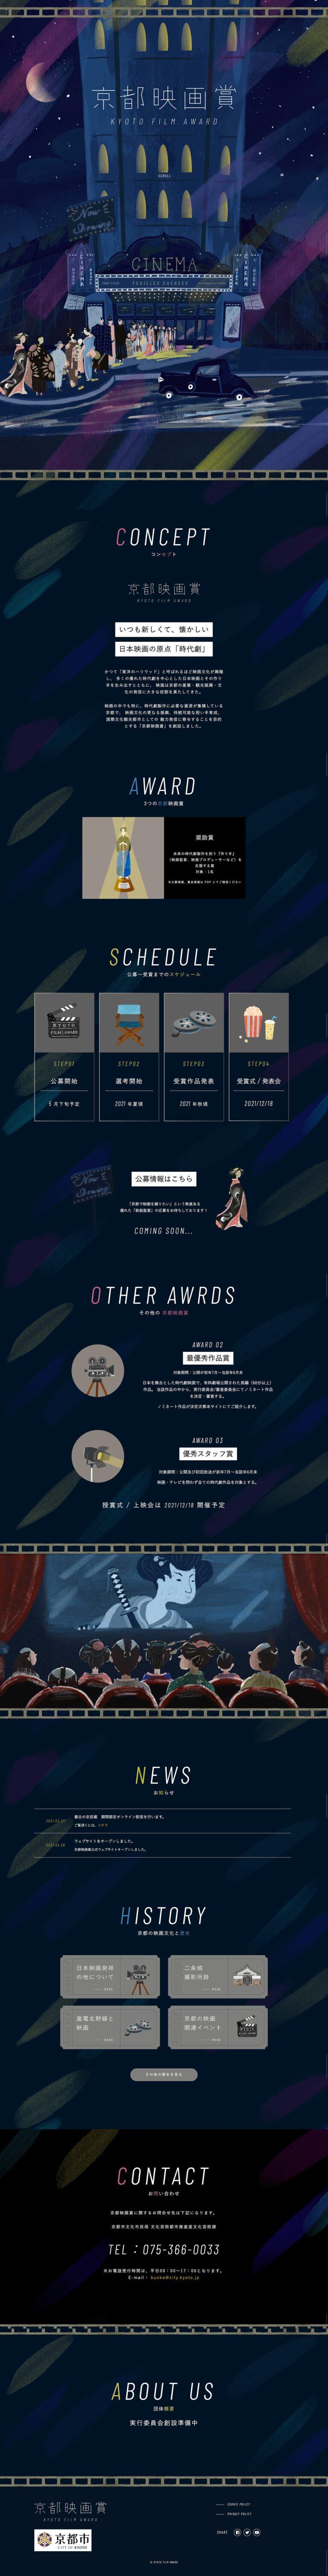 KYOTO Film Award -京都映画賞